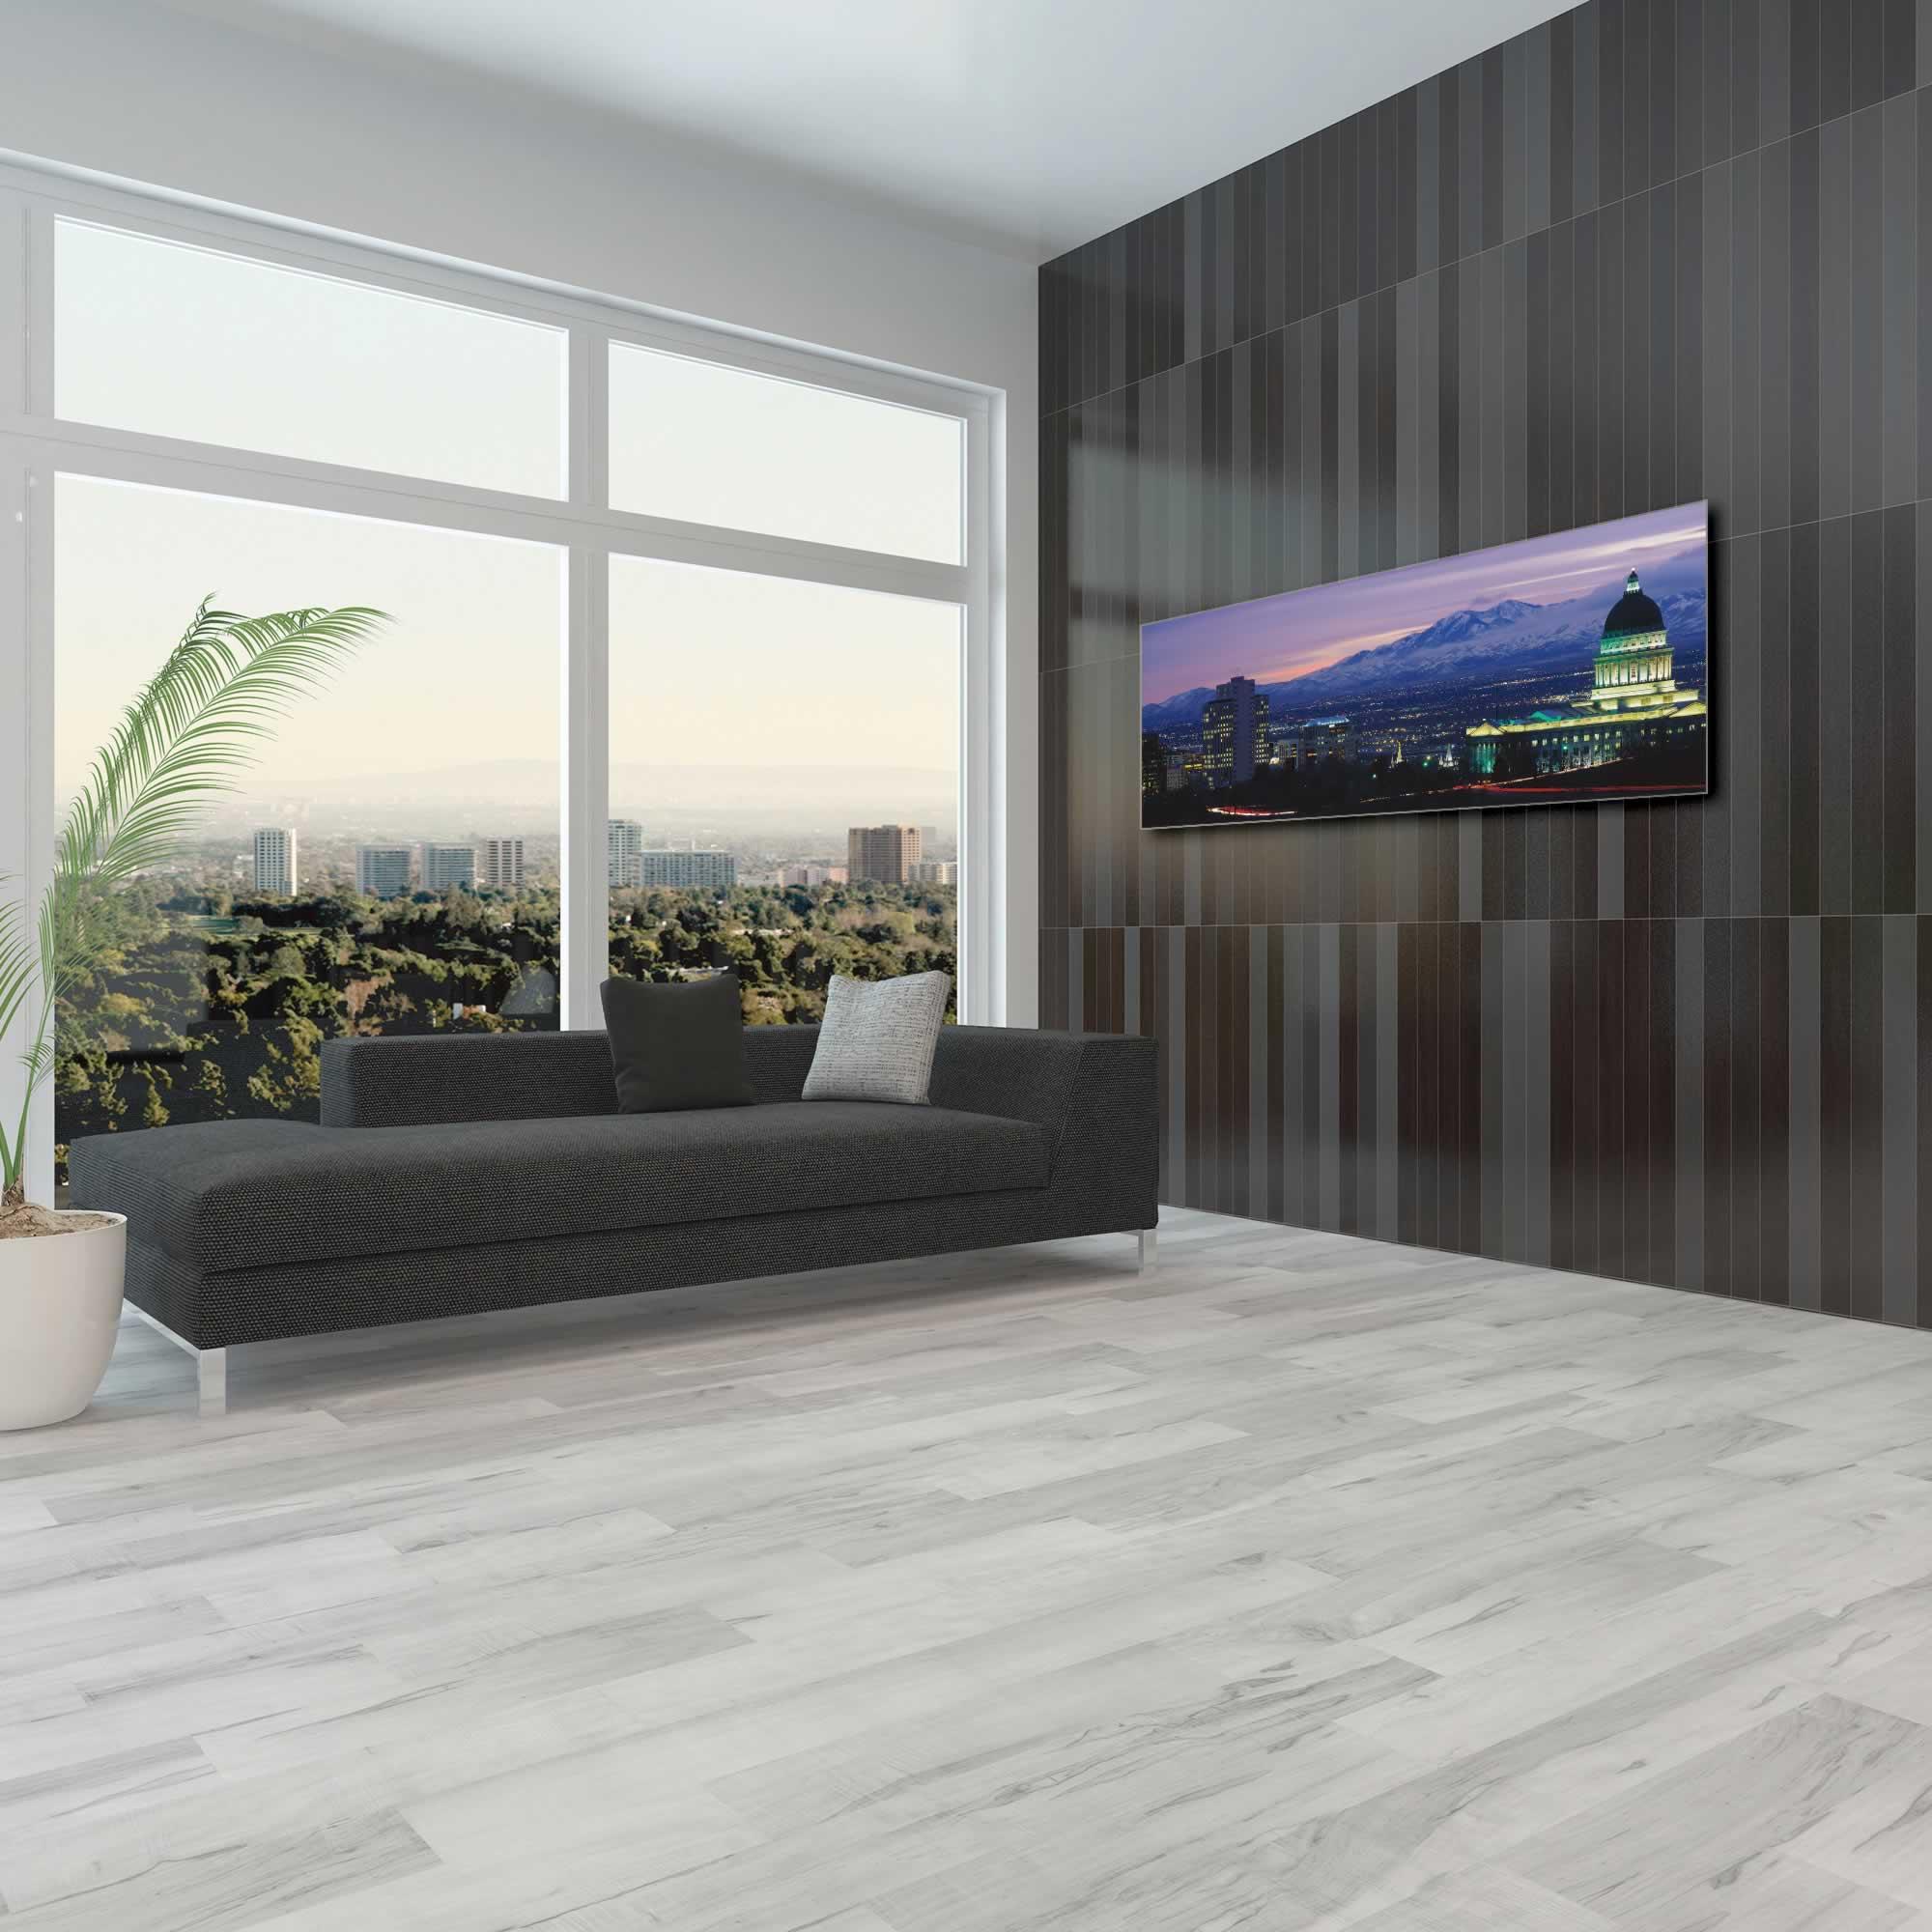 Salt Lake City Skyline - Urban Modern Art, Designer Home Decor, Cityscape Wall Artwork, Trendy Contemporary Art - Alternate View 1